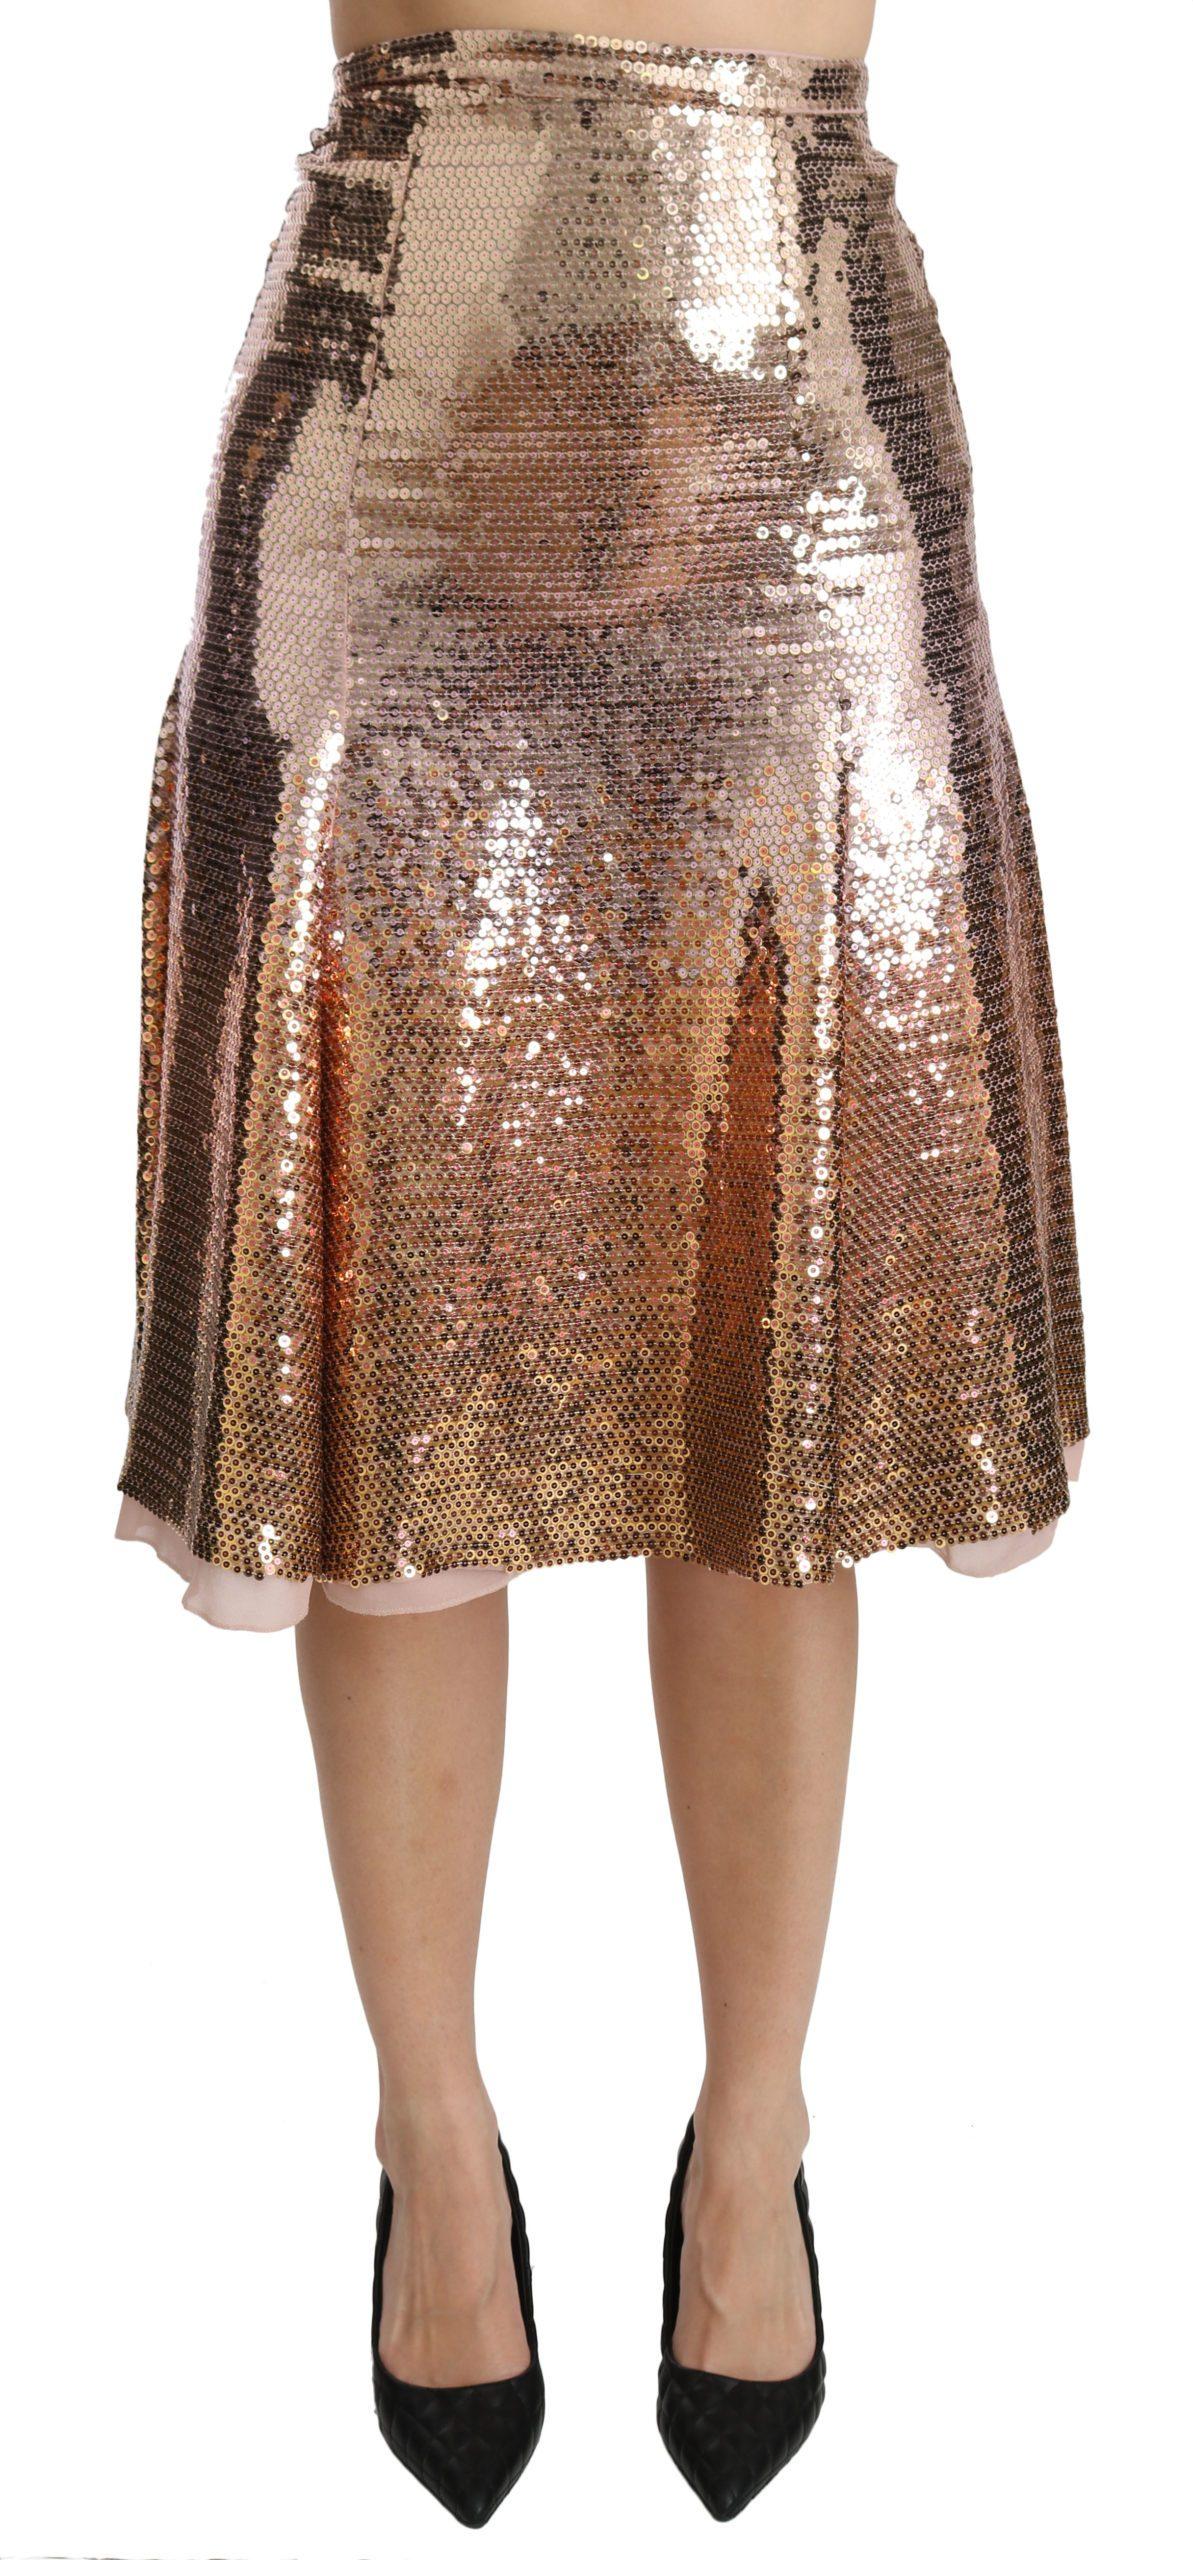 Dolce & Gabbana Women's Sequined High Waist Midi Skirt Gold SKI1343 - IT40|S